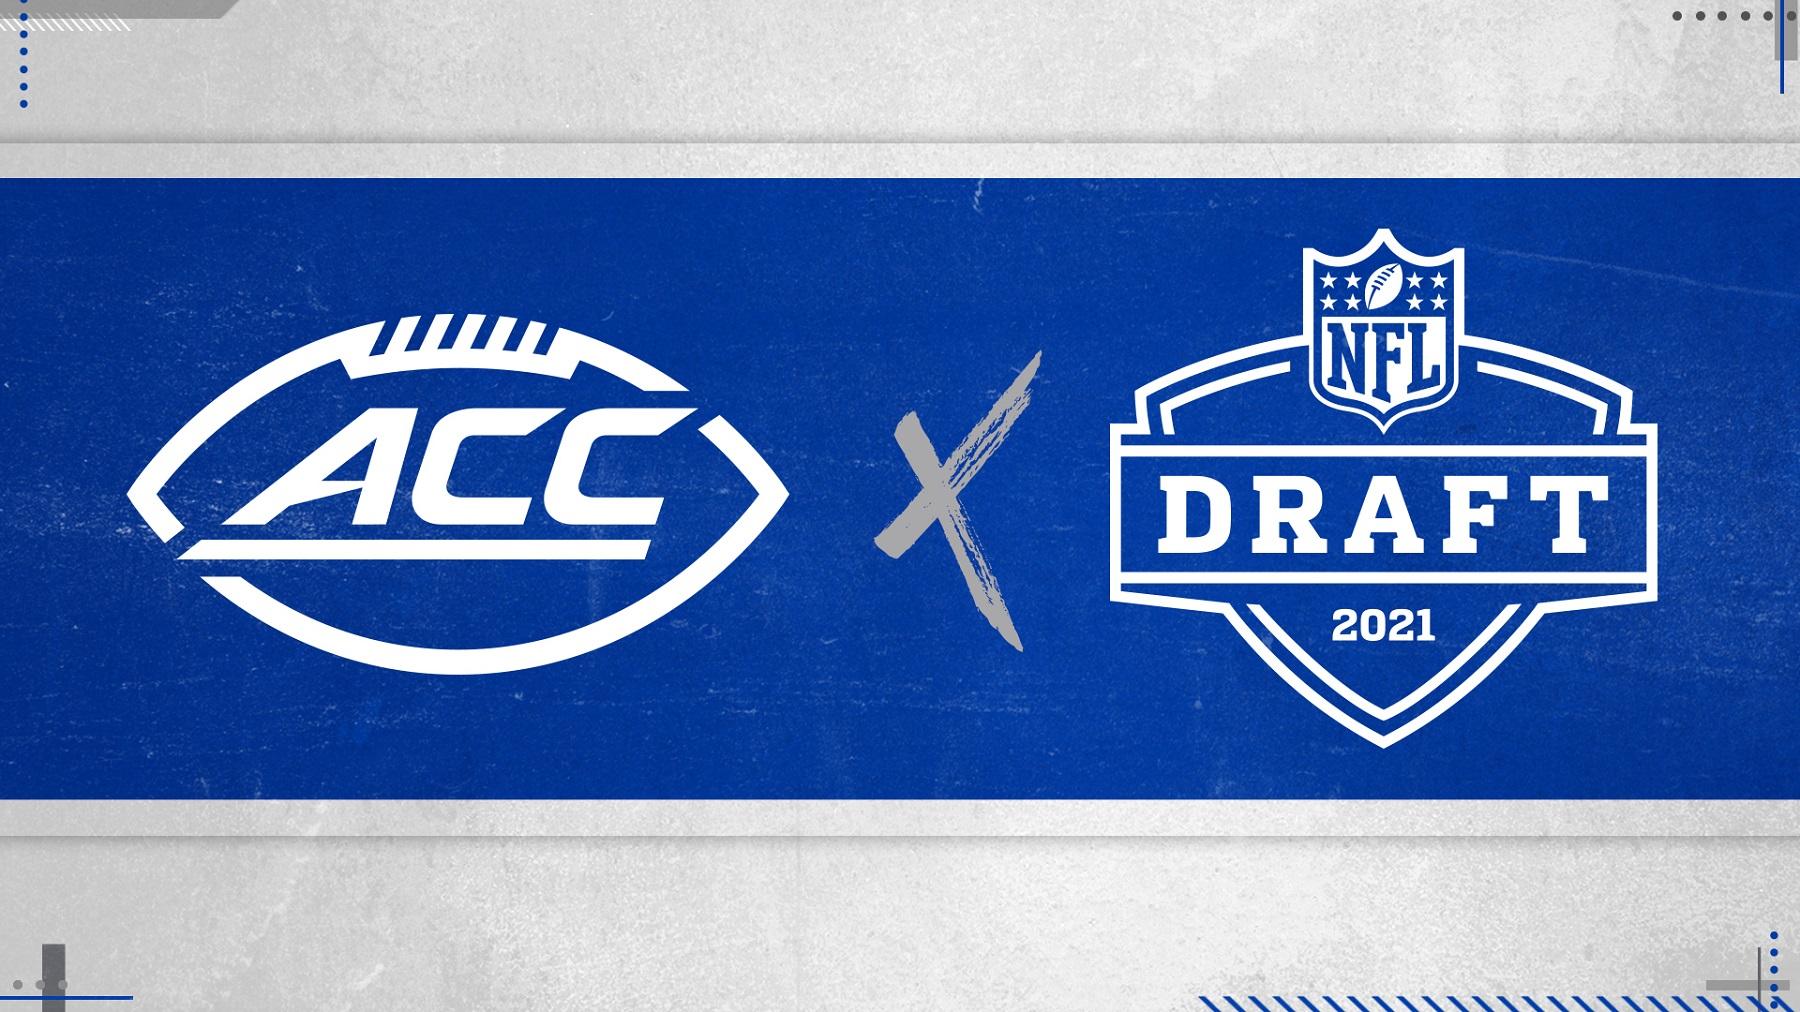 ACC Virginia Tech 2021 nfl draft